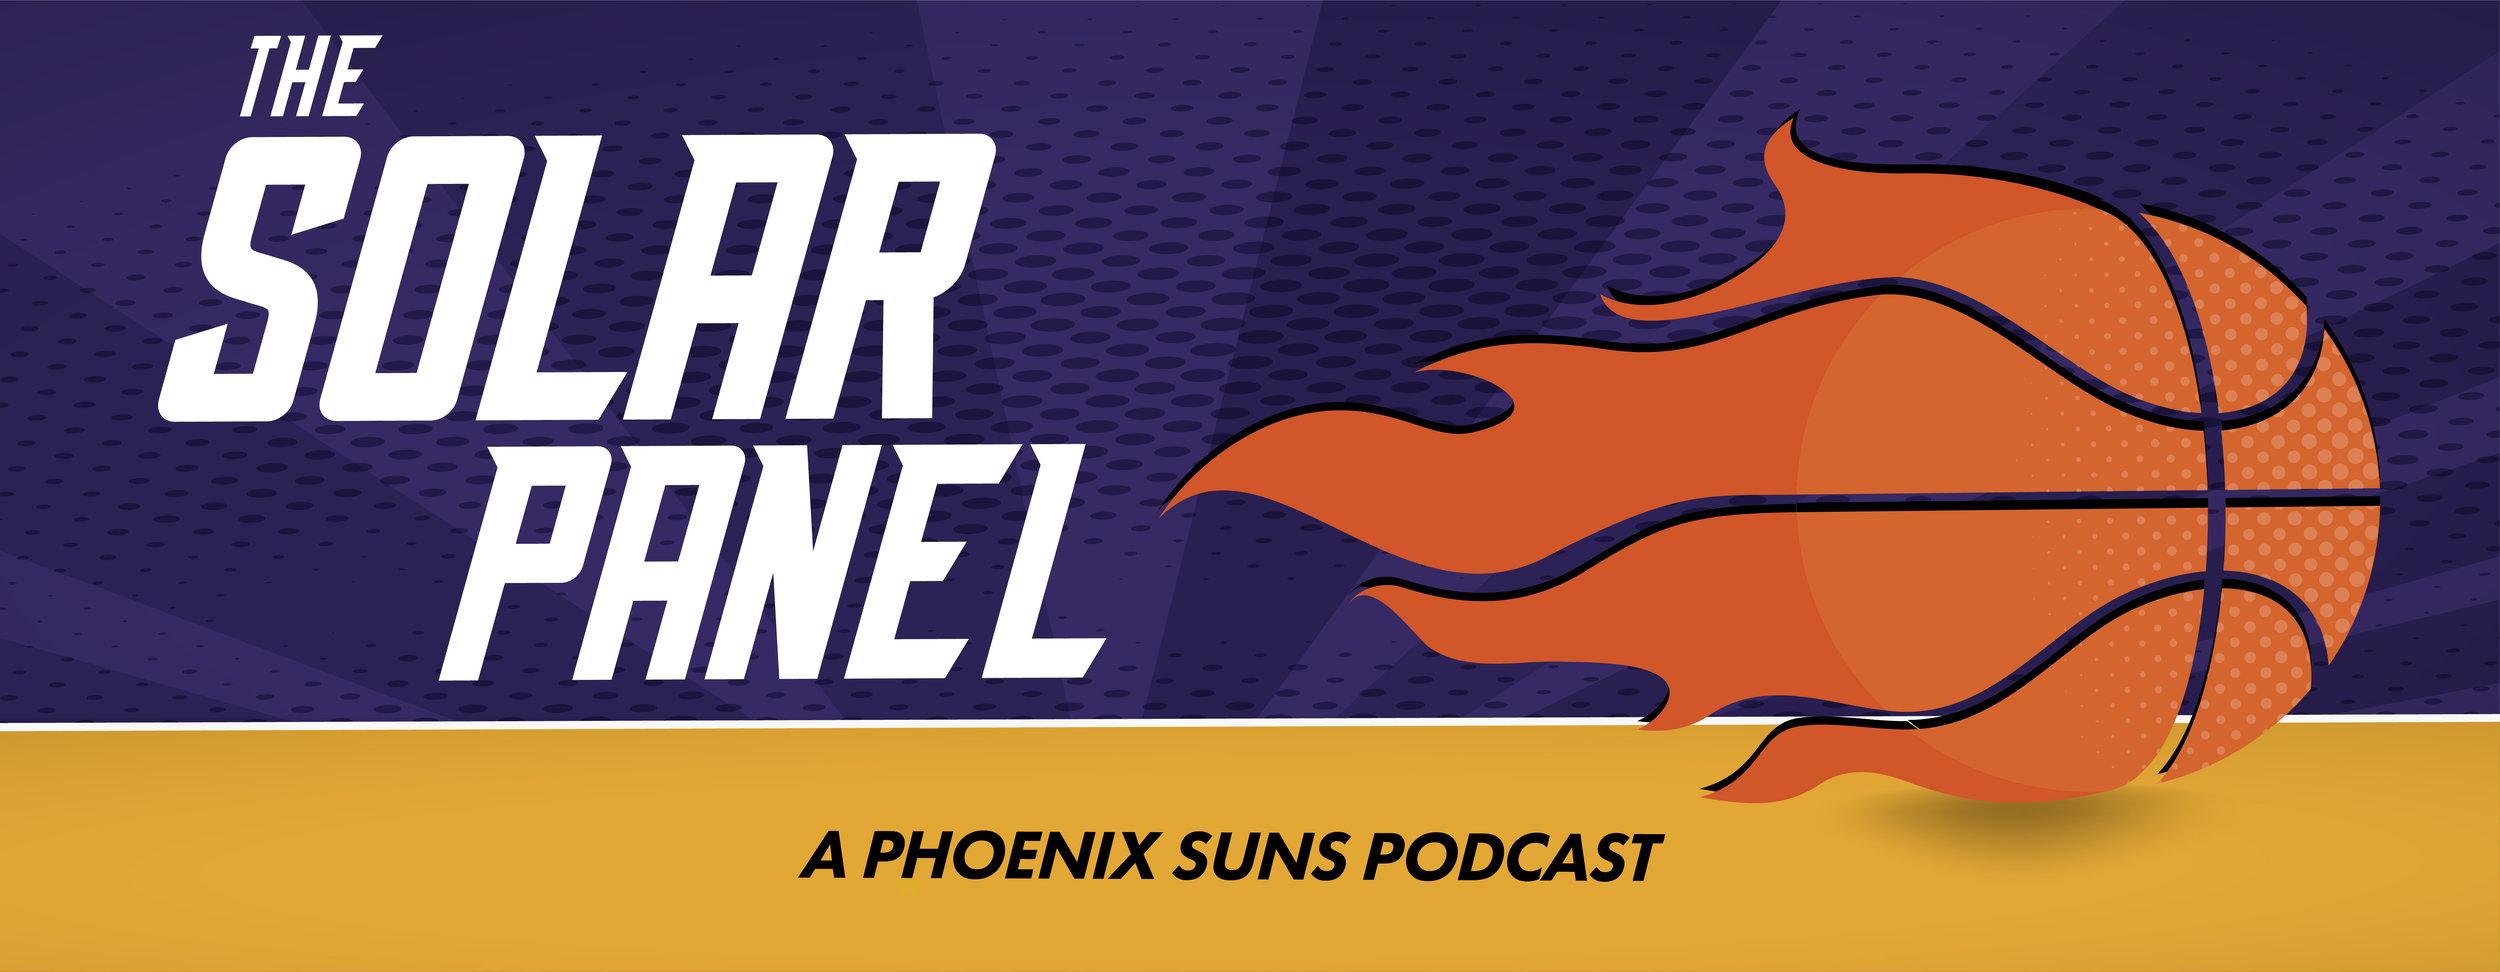 TheSolarPanel_Banner.jpg